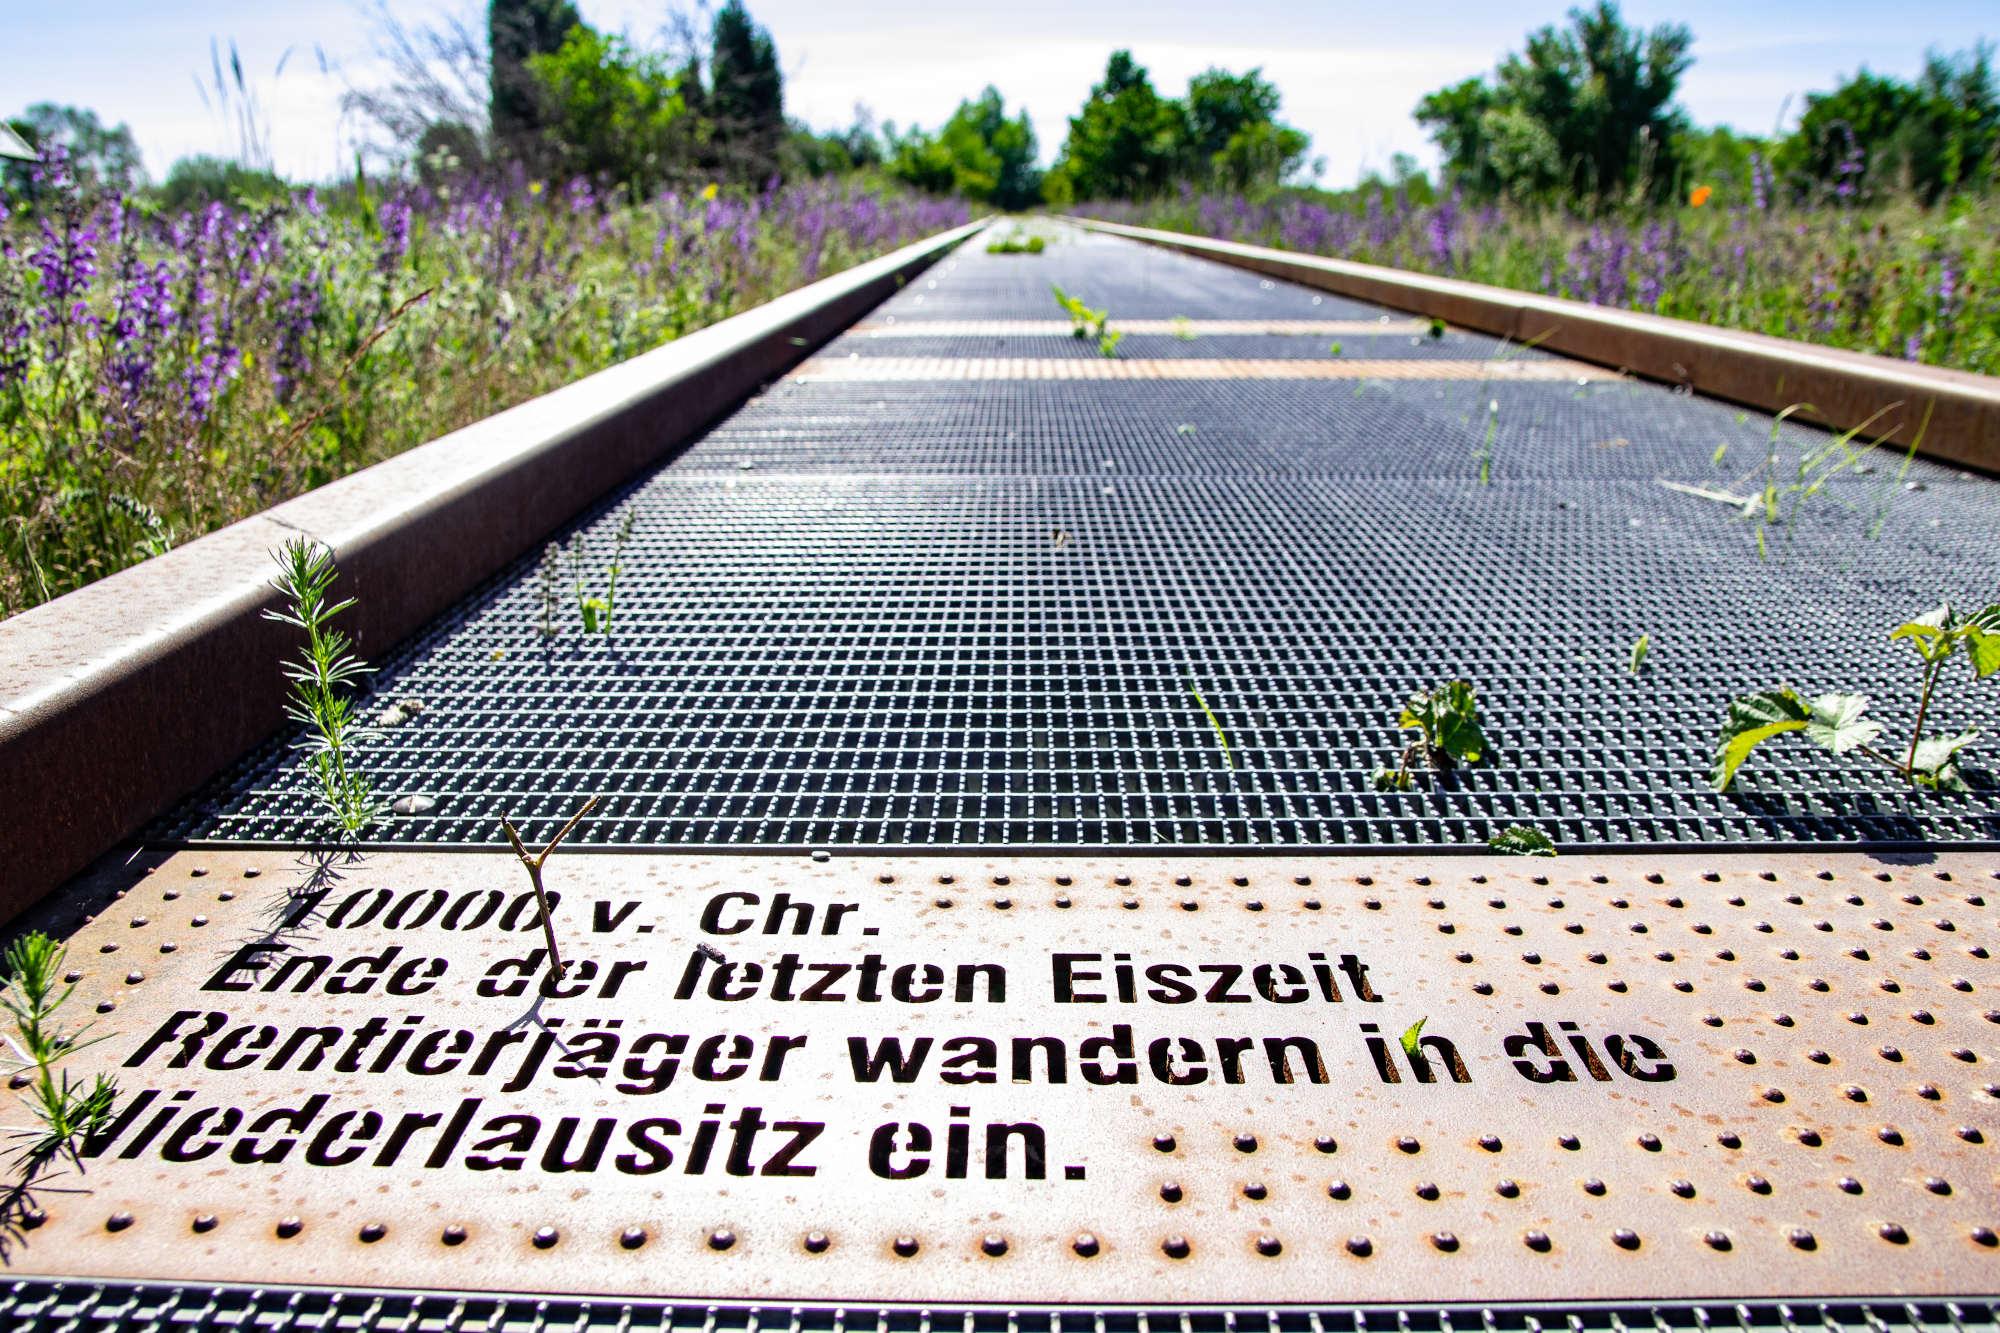 Zeitsteg Slawenburg Raddusch, Foto: Oe Grafik_sk